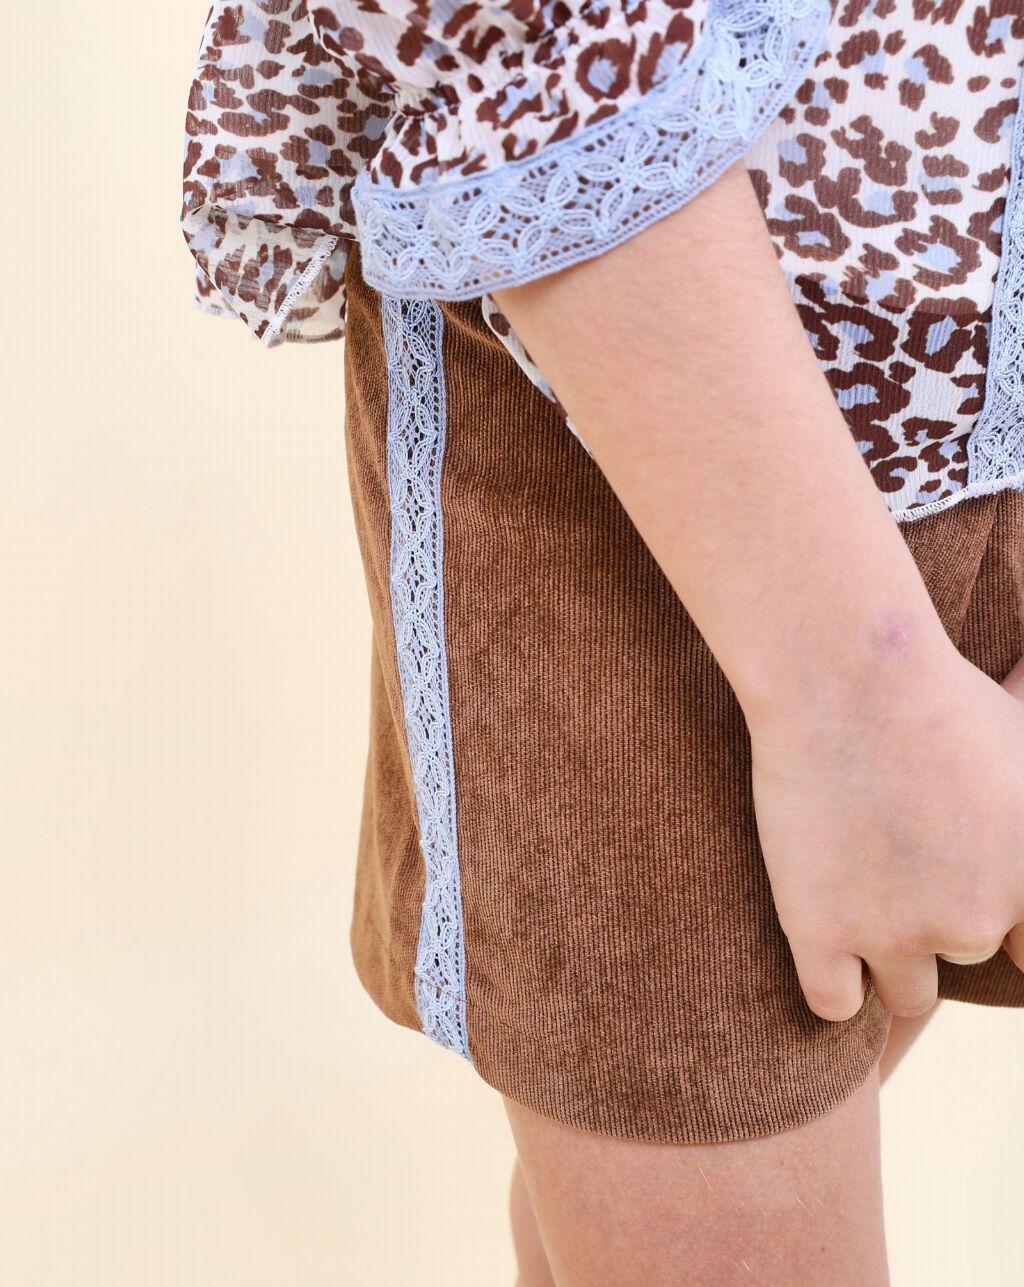 Pan con Chocolate: Shorts Trudy